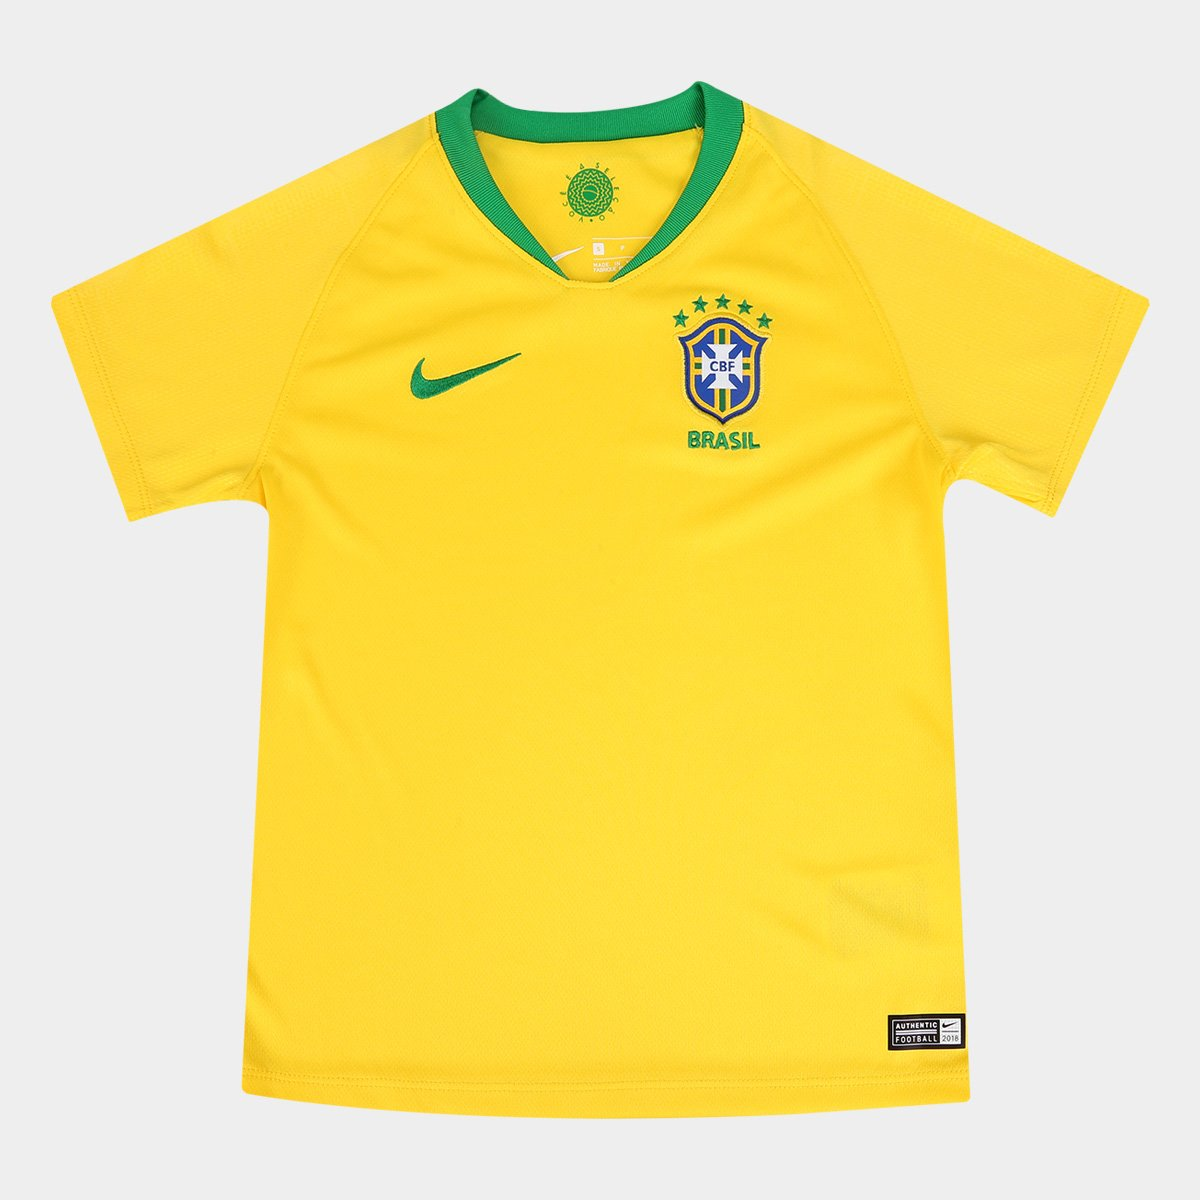 92a48c0b3c Camisa Seleção Brasil Infantil I 2018 s n° - Nike